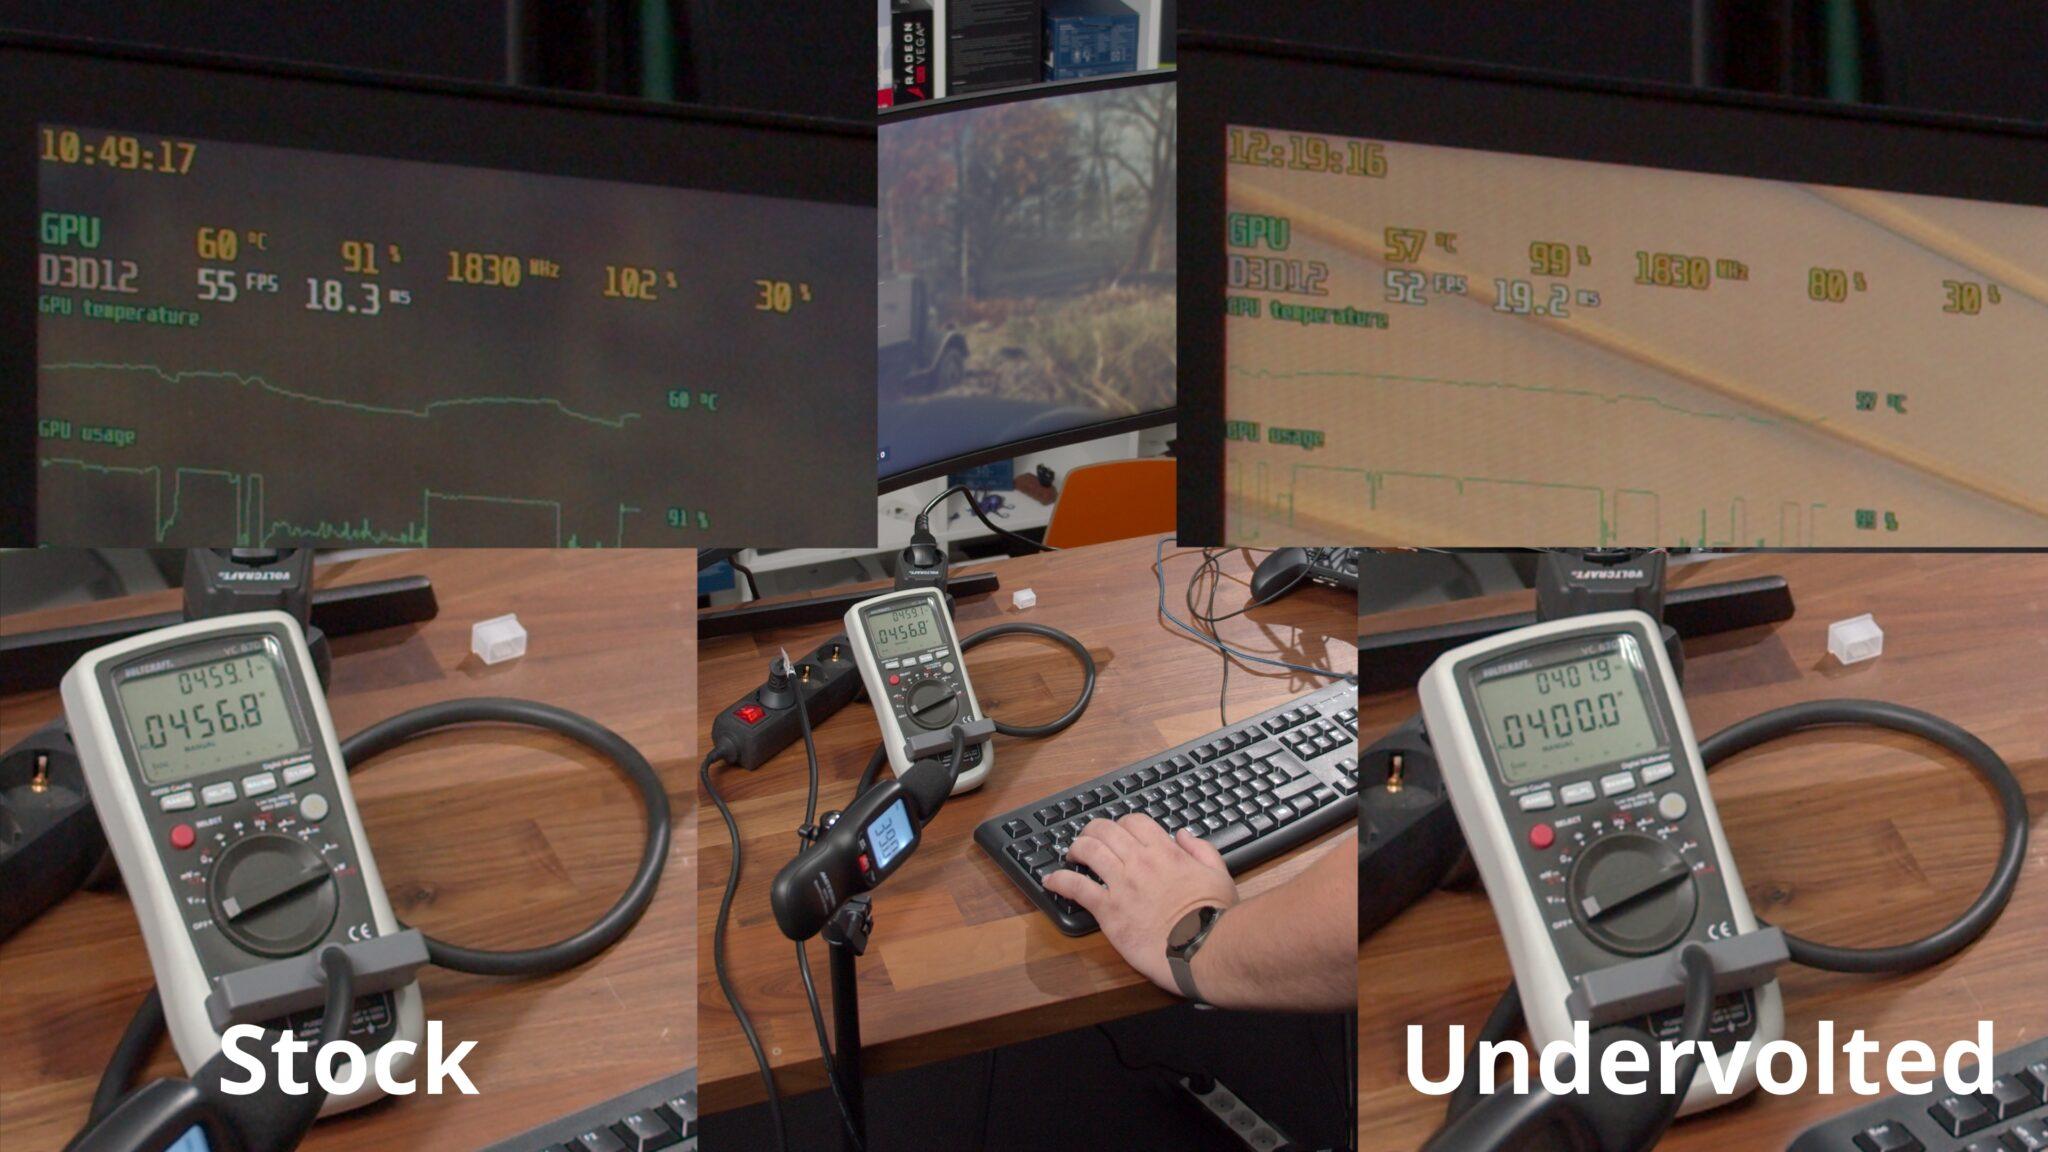 Gainward RTX 3080 Undervolted